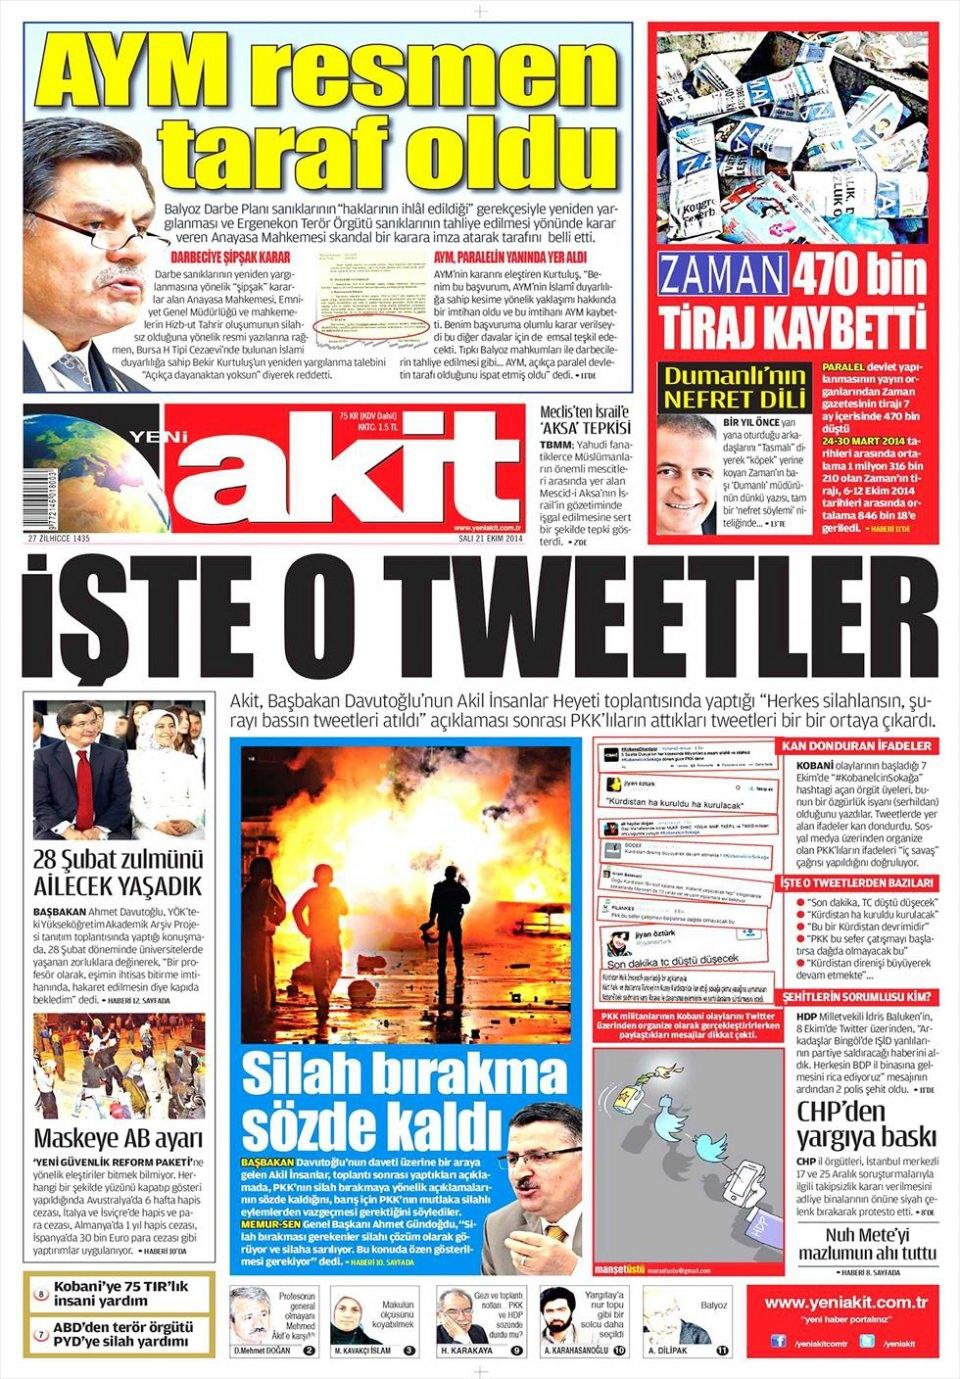 21 Ekim 2014 gazete manşetleri 21